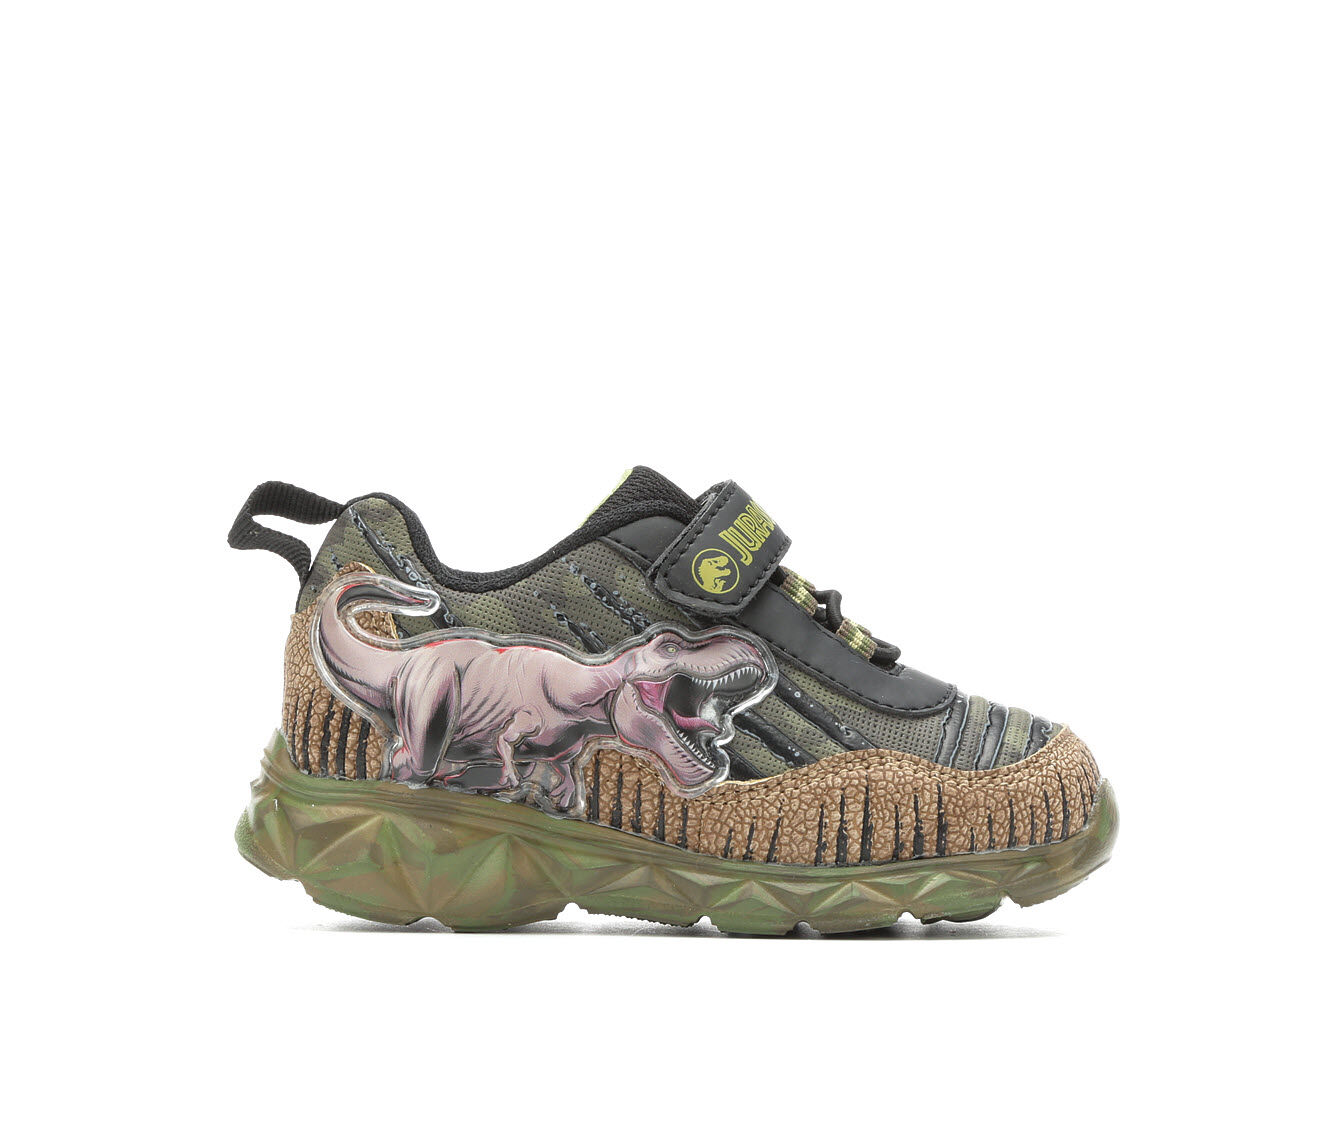 Boys' Light-Up Shoes | Shoe Carnival